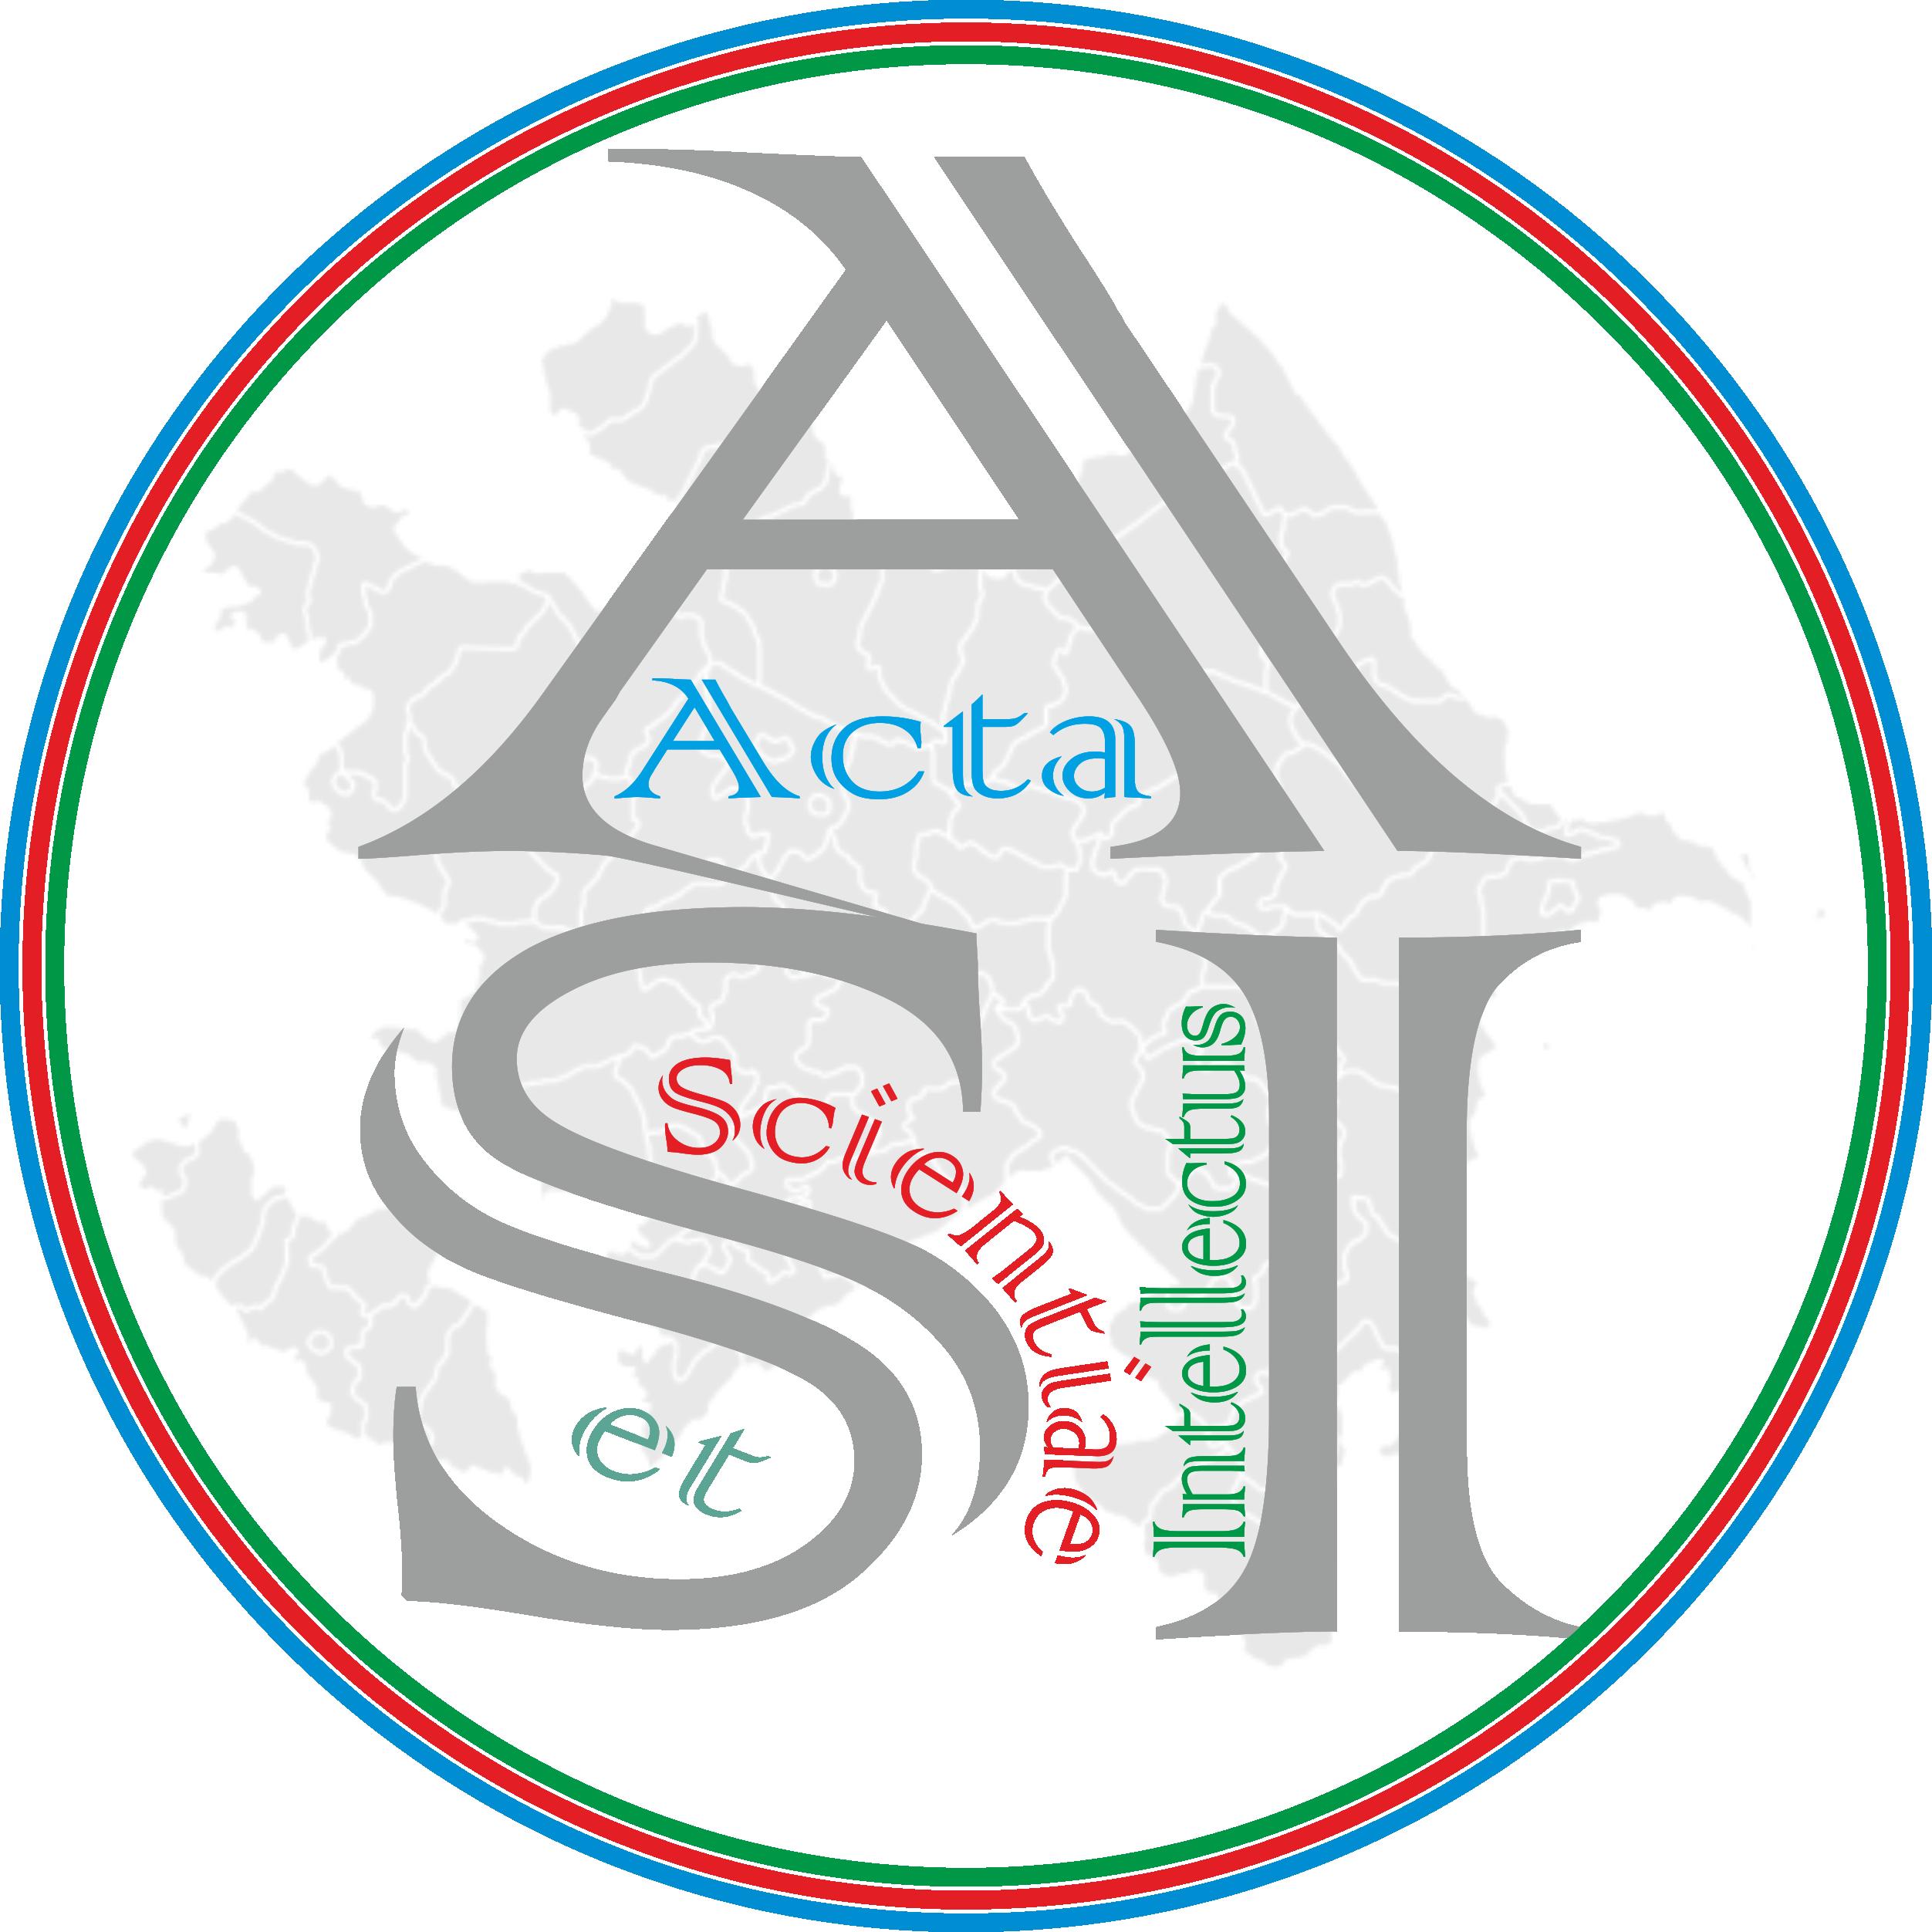 Acta Sci. Intell.